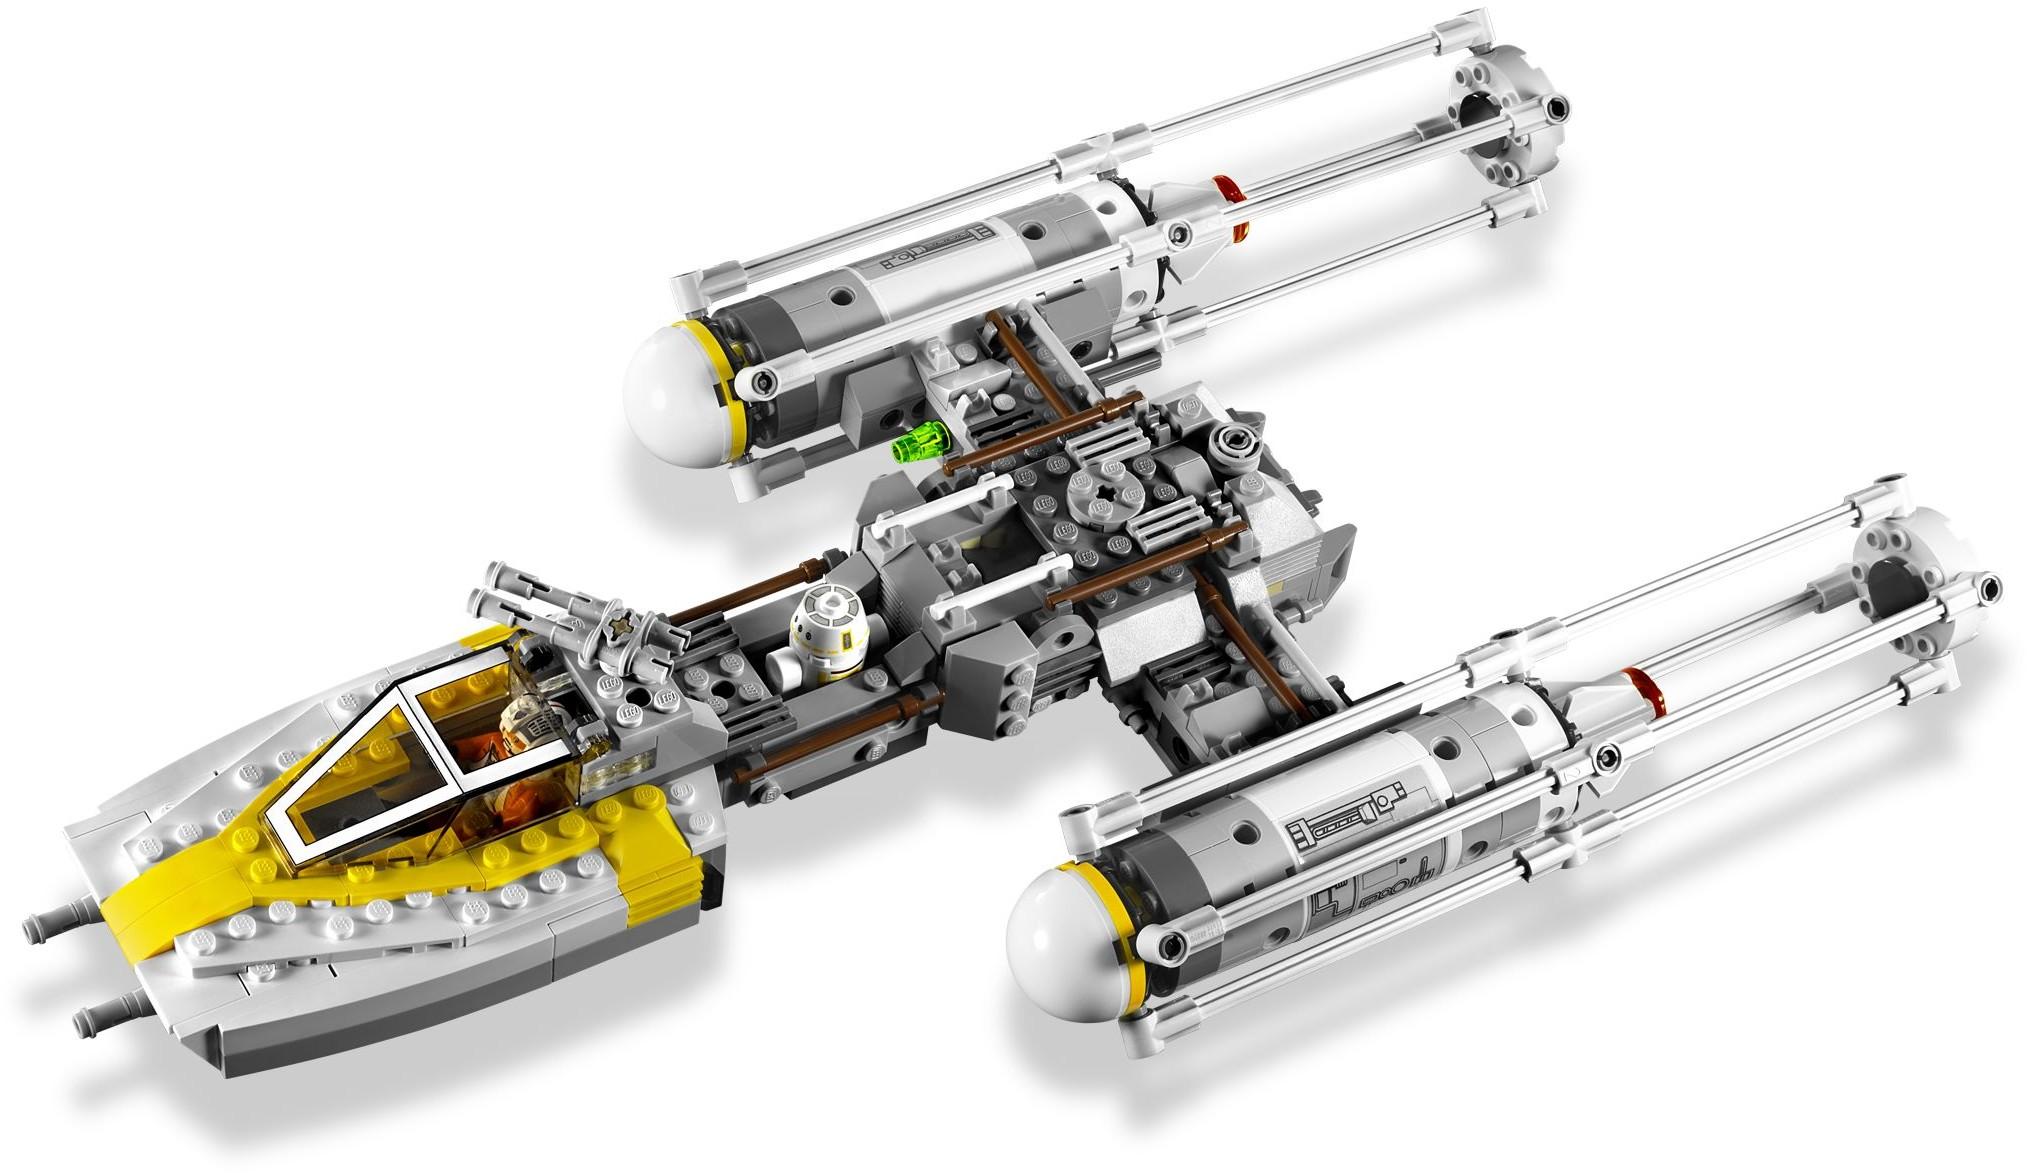 Bricktoyco Lego 75172 Star Wars Rogue One Y Wing Starfighter Speed